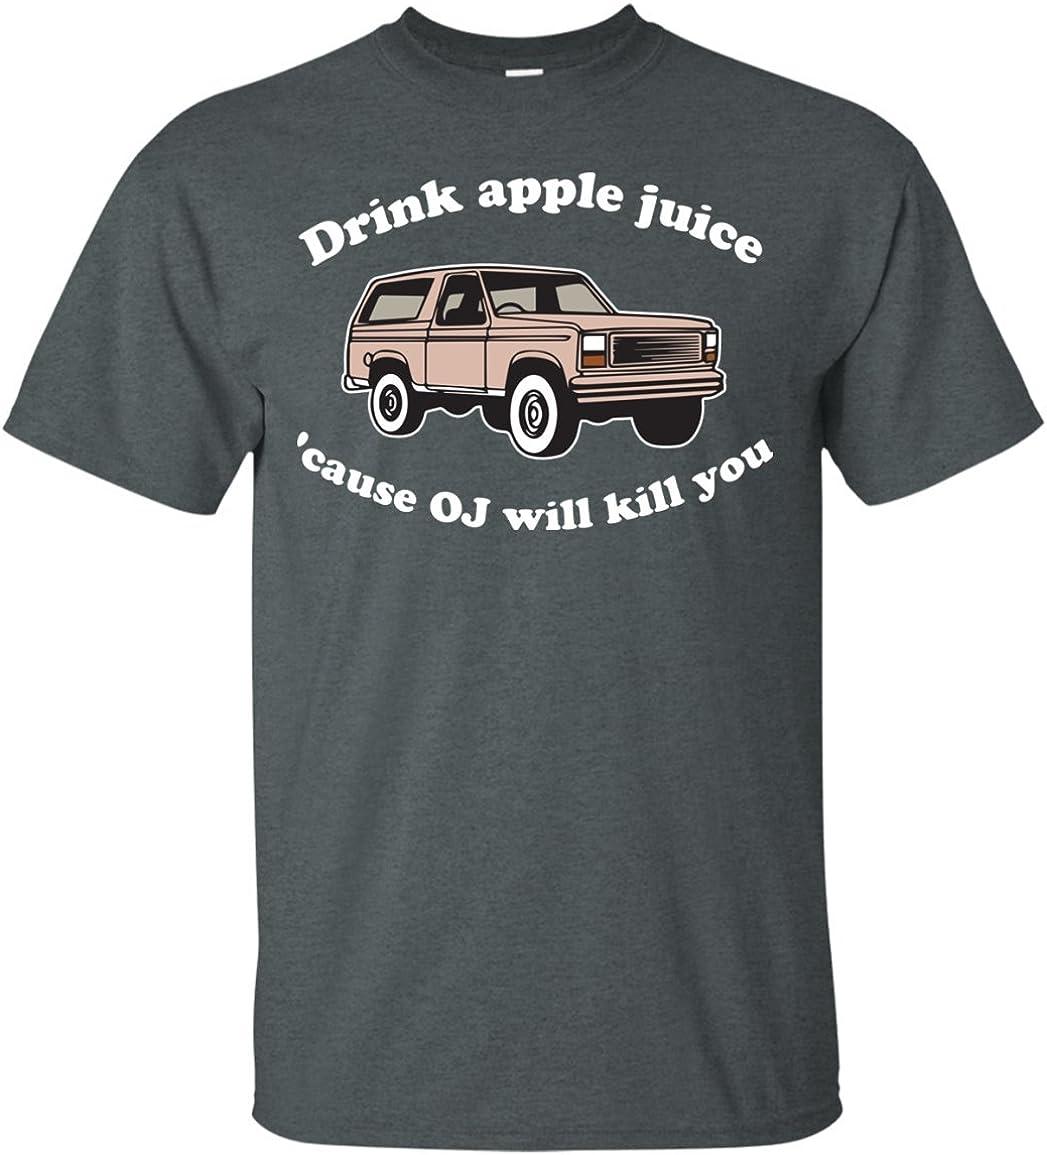 Top 8 Drink Apple Juice Because Oj Will Kill You